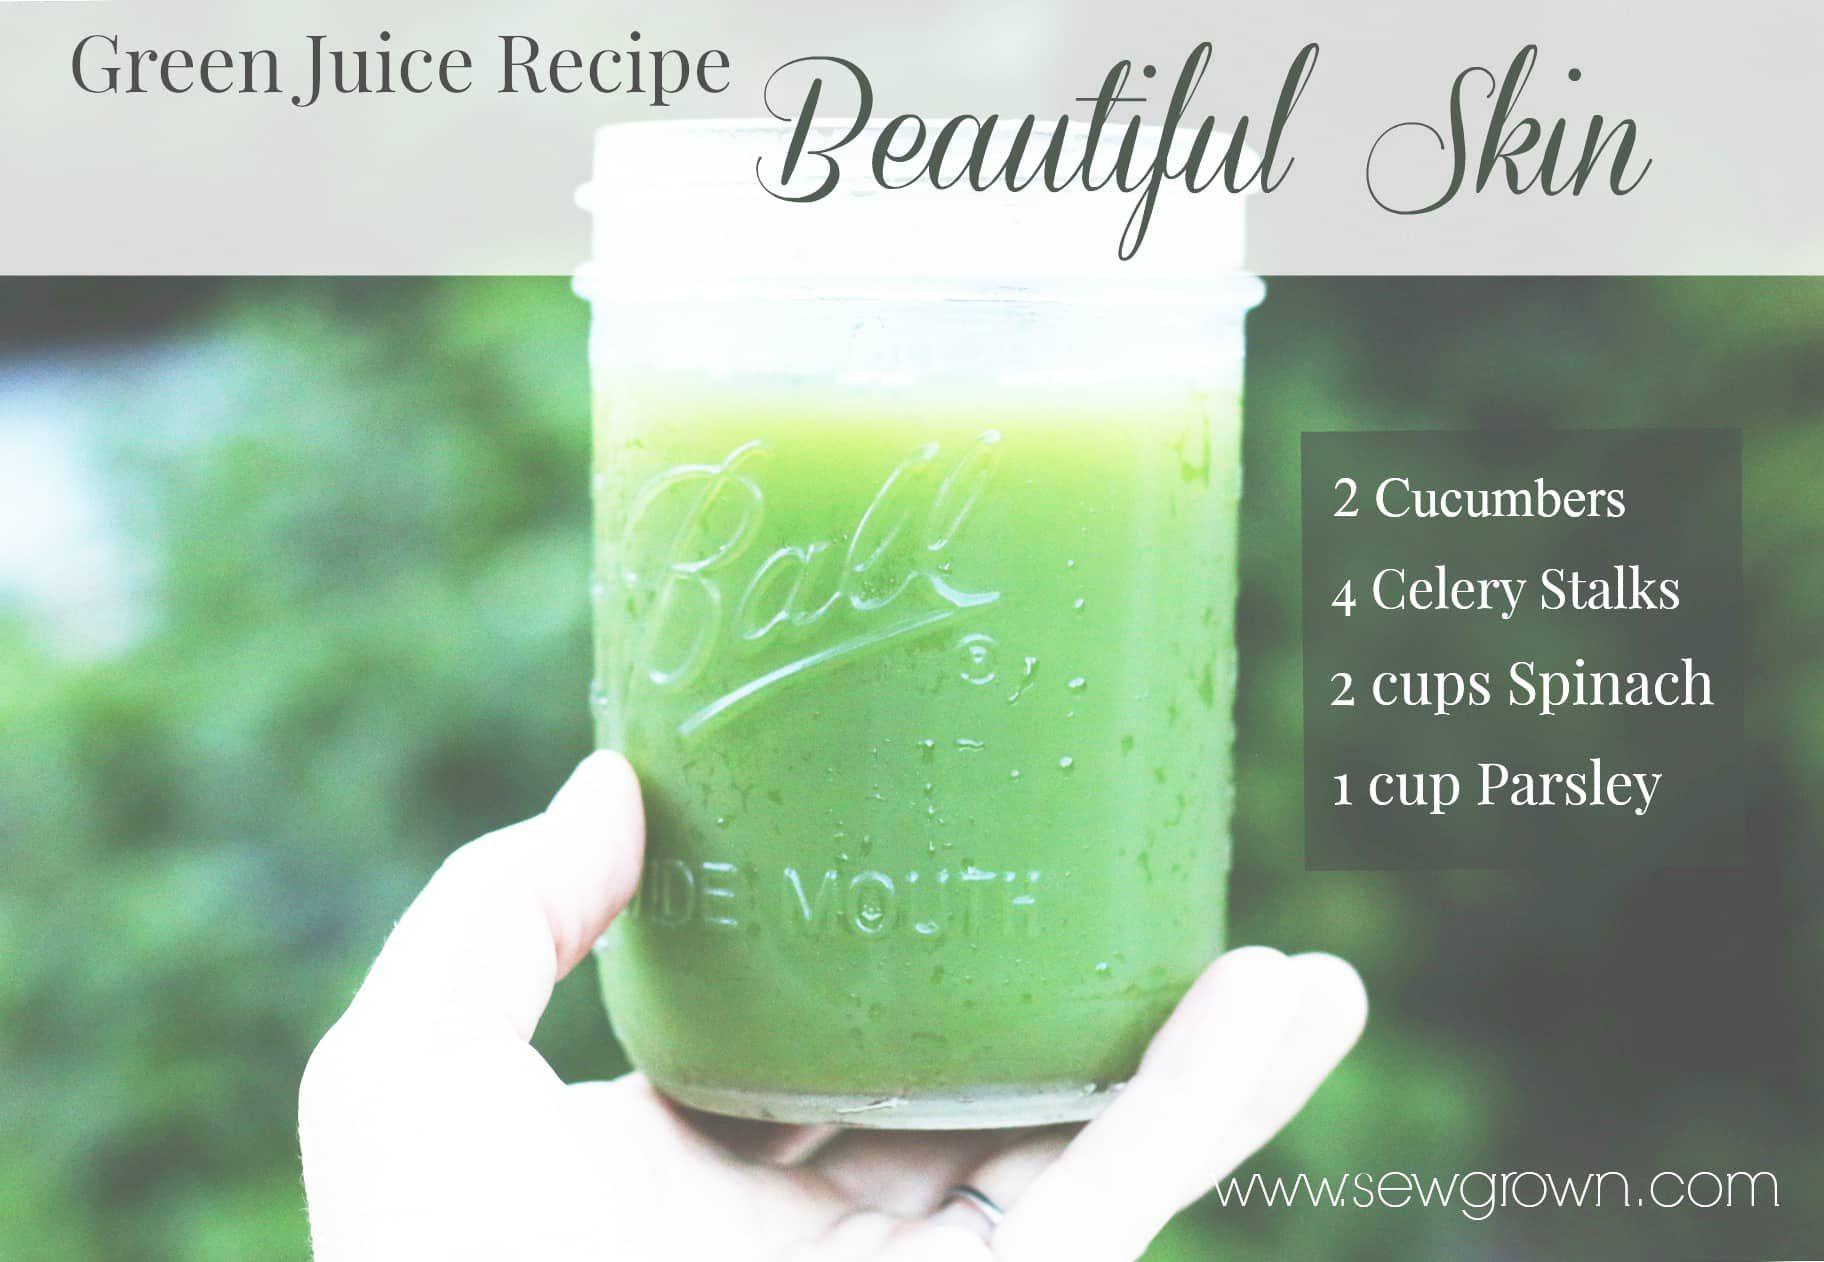 Beatiful Skin Juicing recipe Green juice recipes, Green